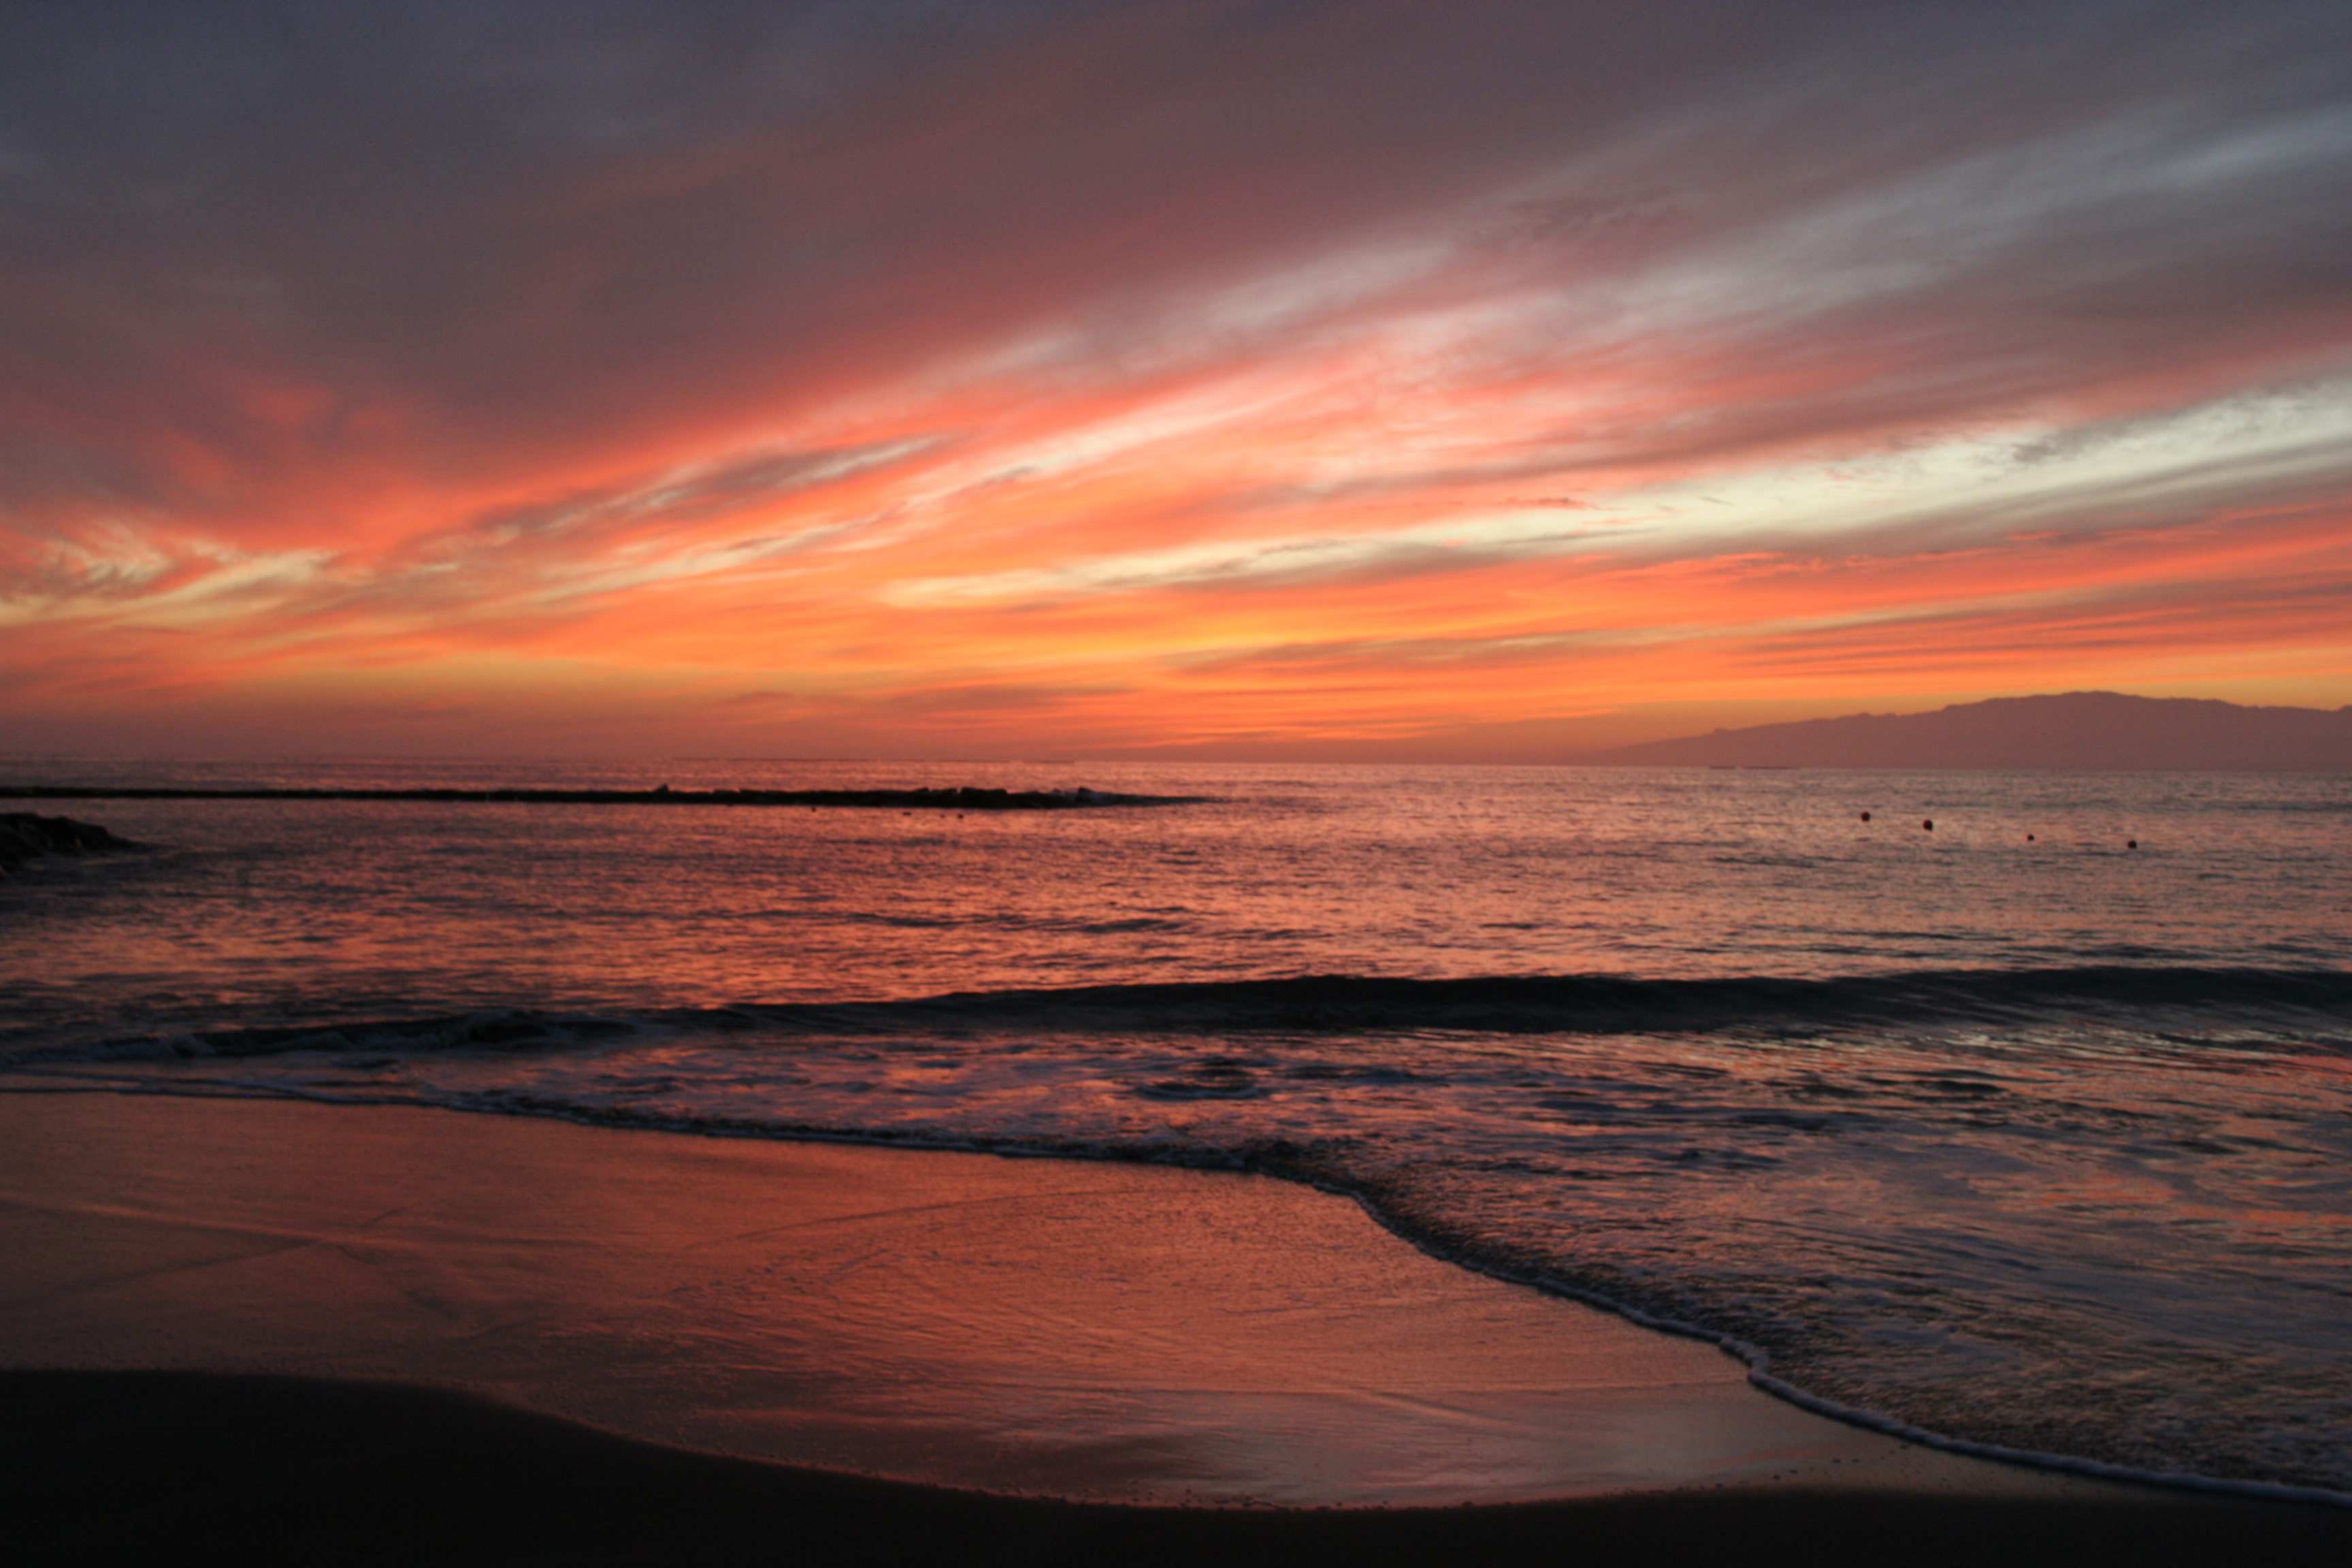 Fanabe Beach Sunset HD Wallpaper Nature Wallpapers 3456x2304